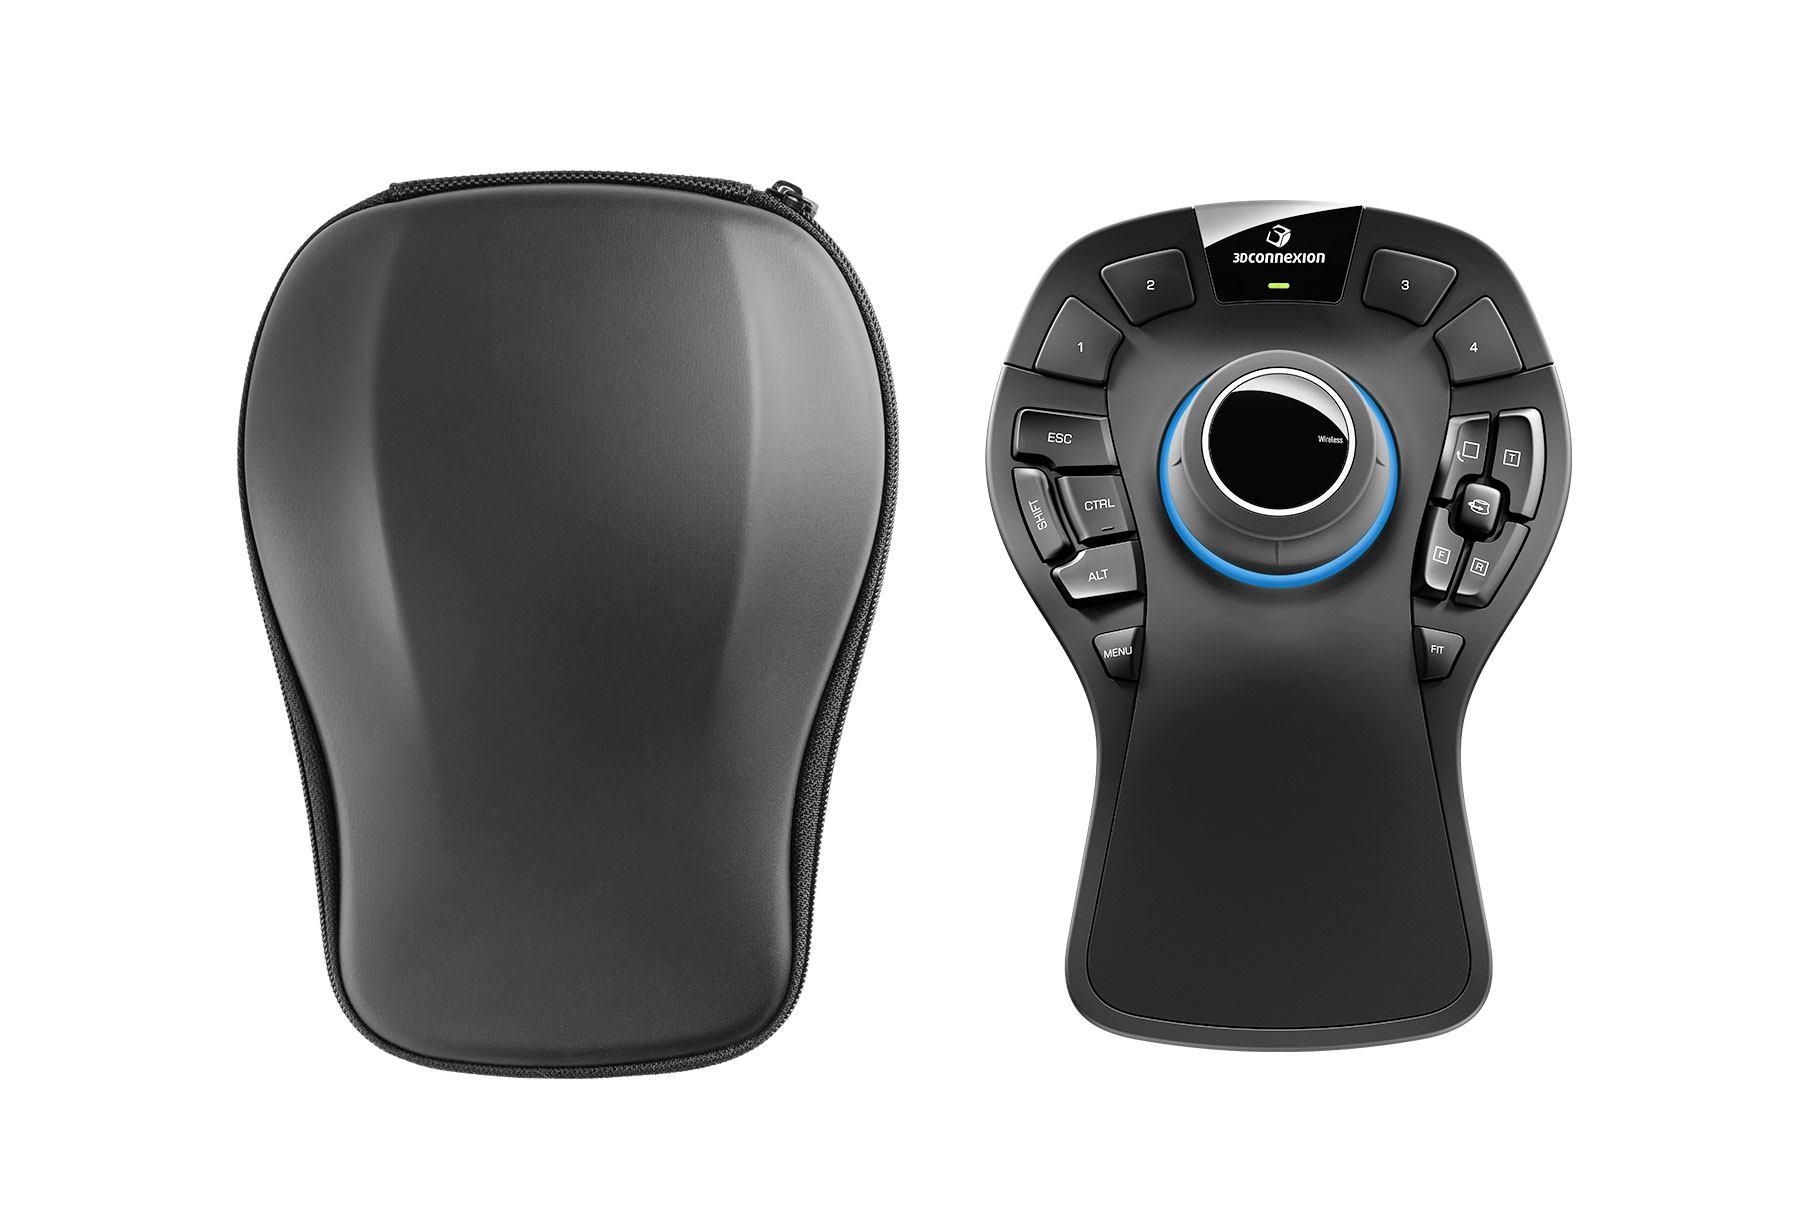 2061195-3Dconnexion-SpaceMouse-Pro-Wireless-mouse-RF-Wireless-6DoF-3Dconnexion